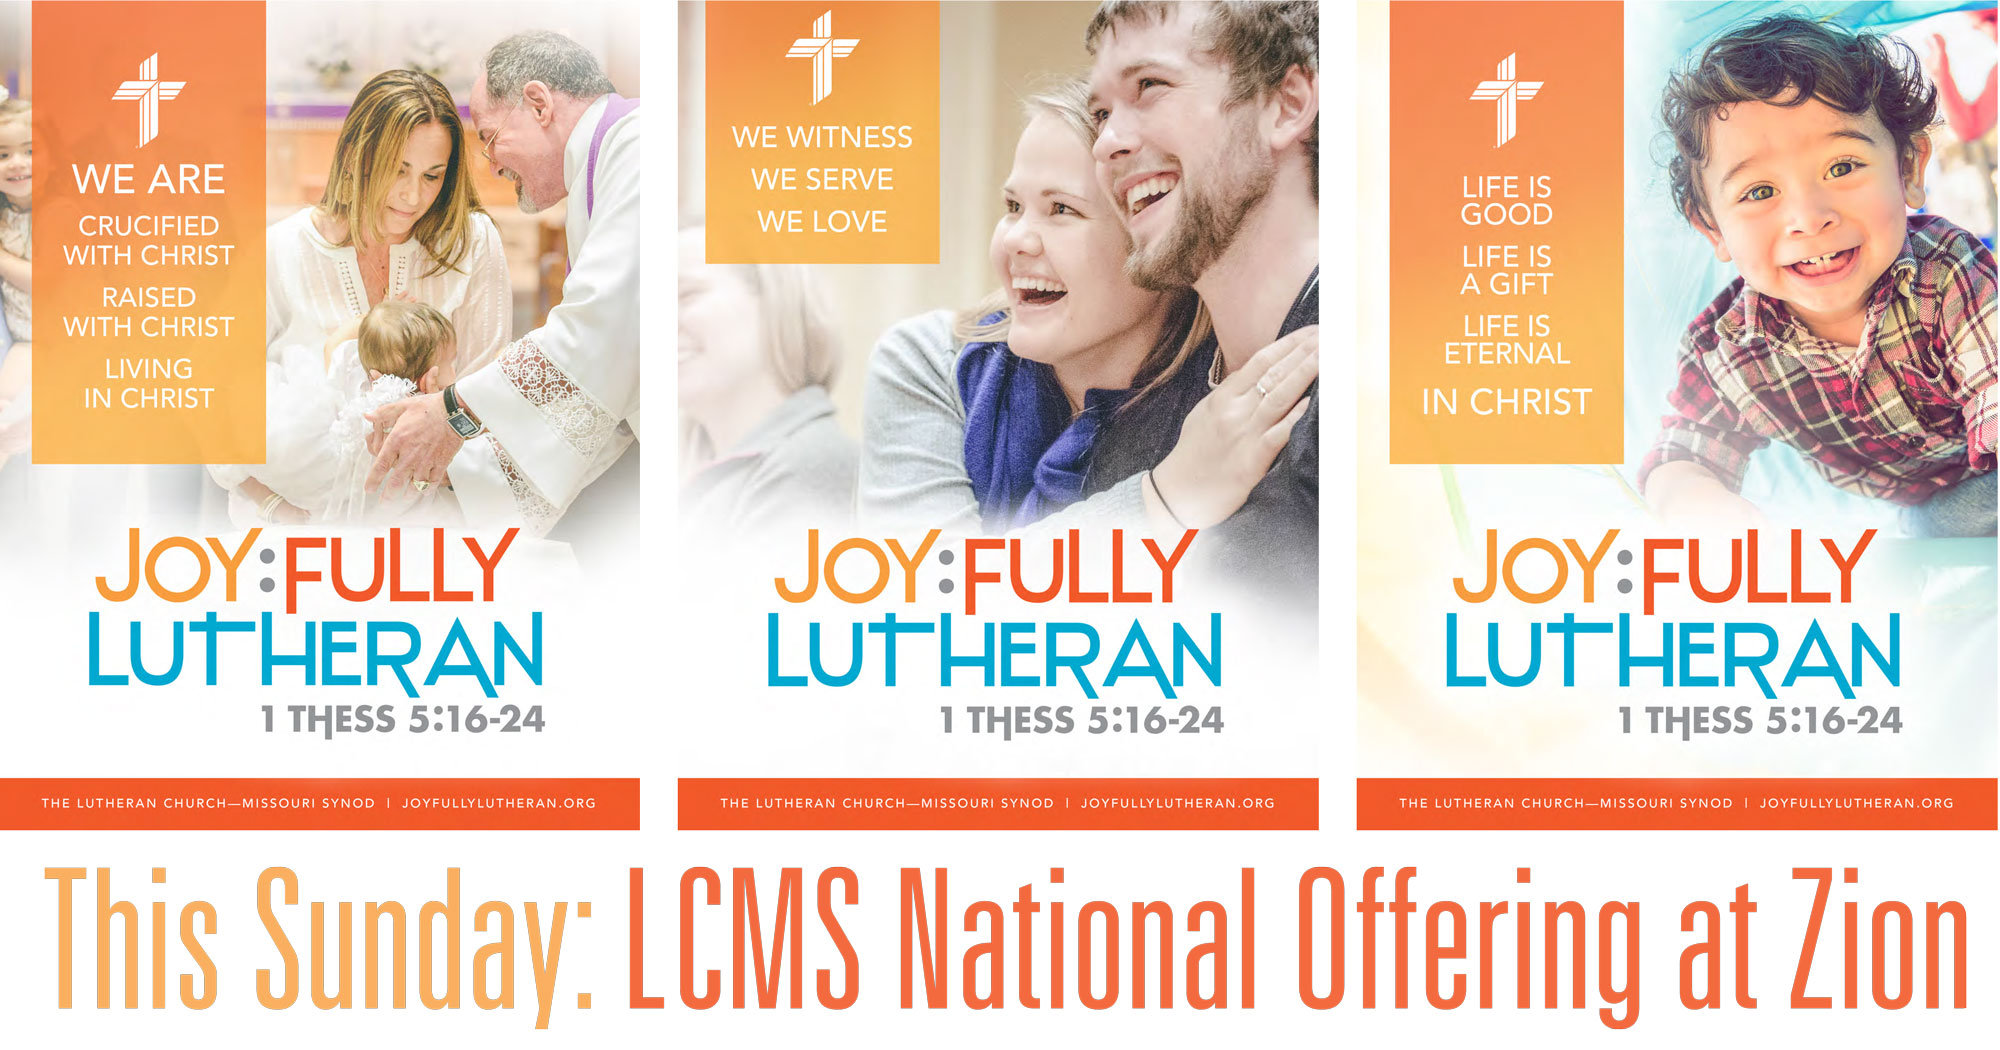 Joyfully-Lutheran-Flyers-collection.jpg